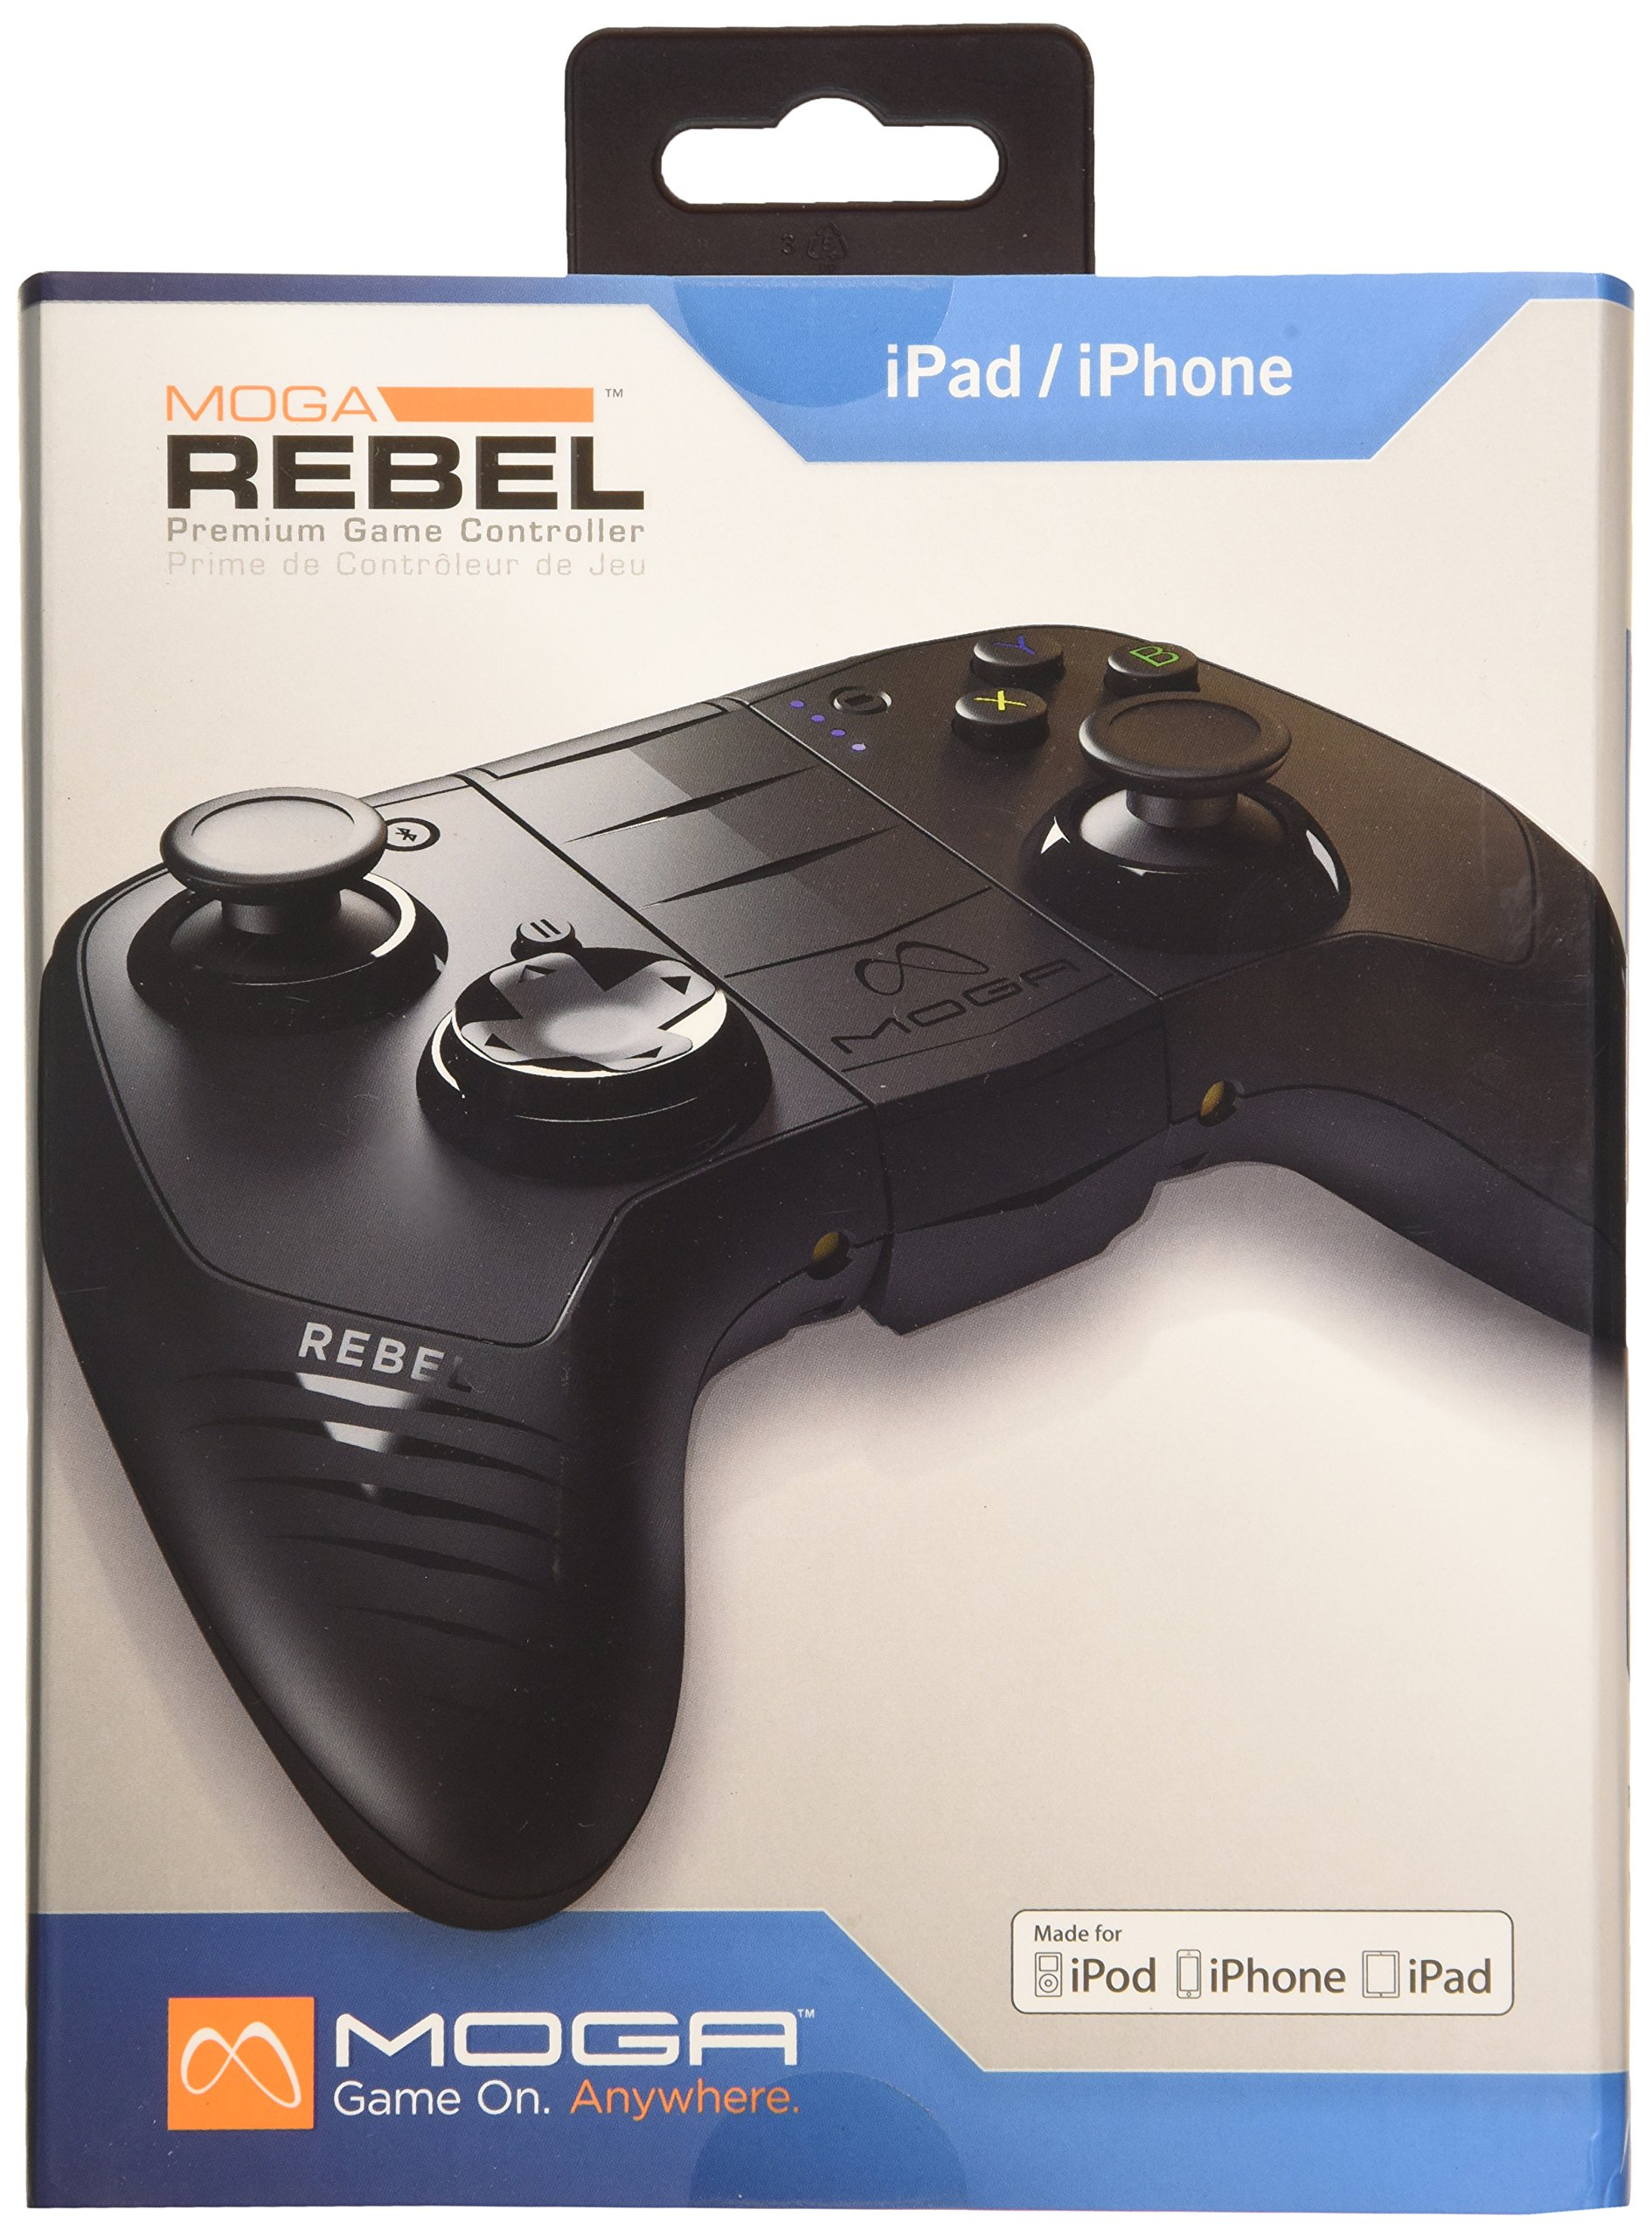 MOGA Rebel Premium iOS Gaming Controller - iPhone/iPad/iPod (Mac)